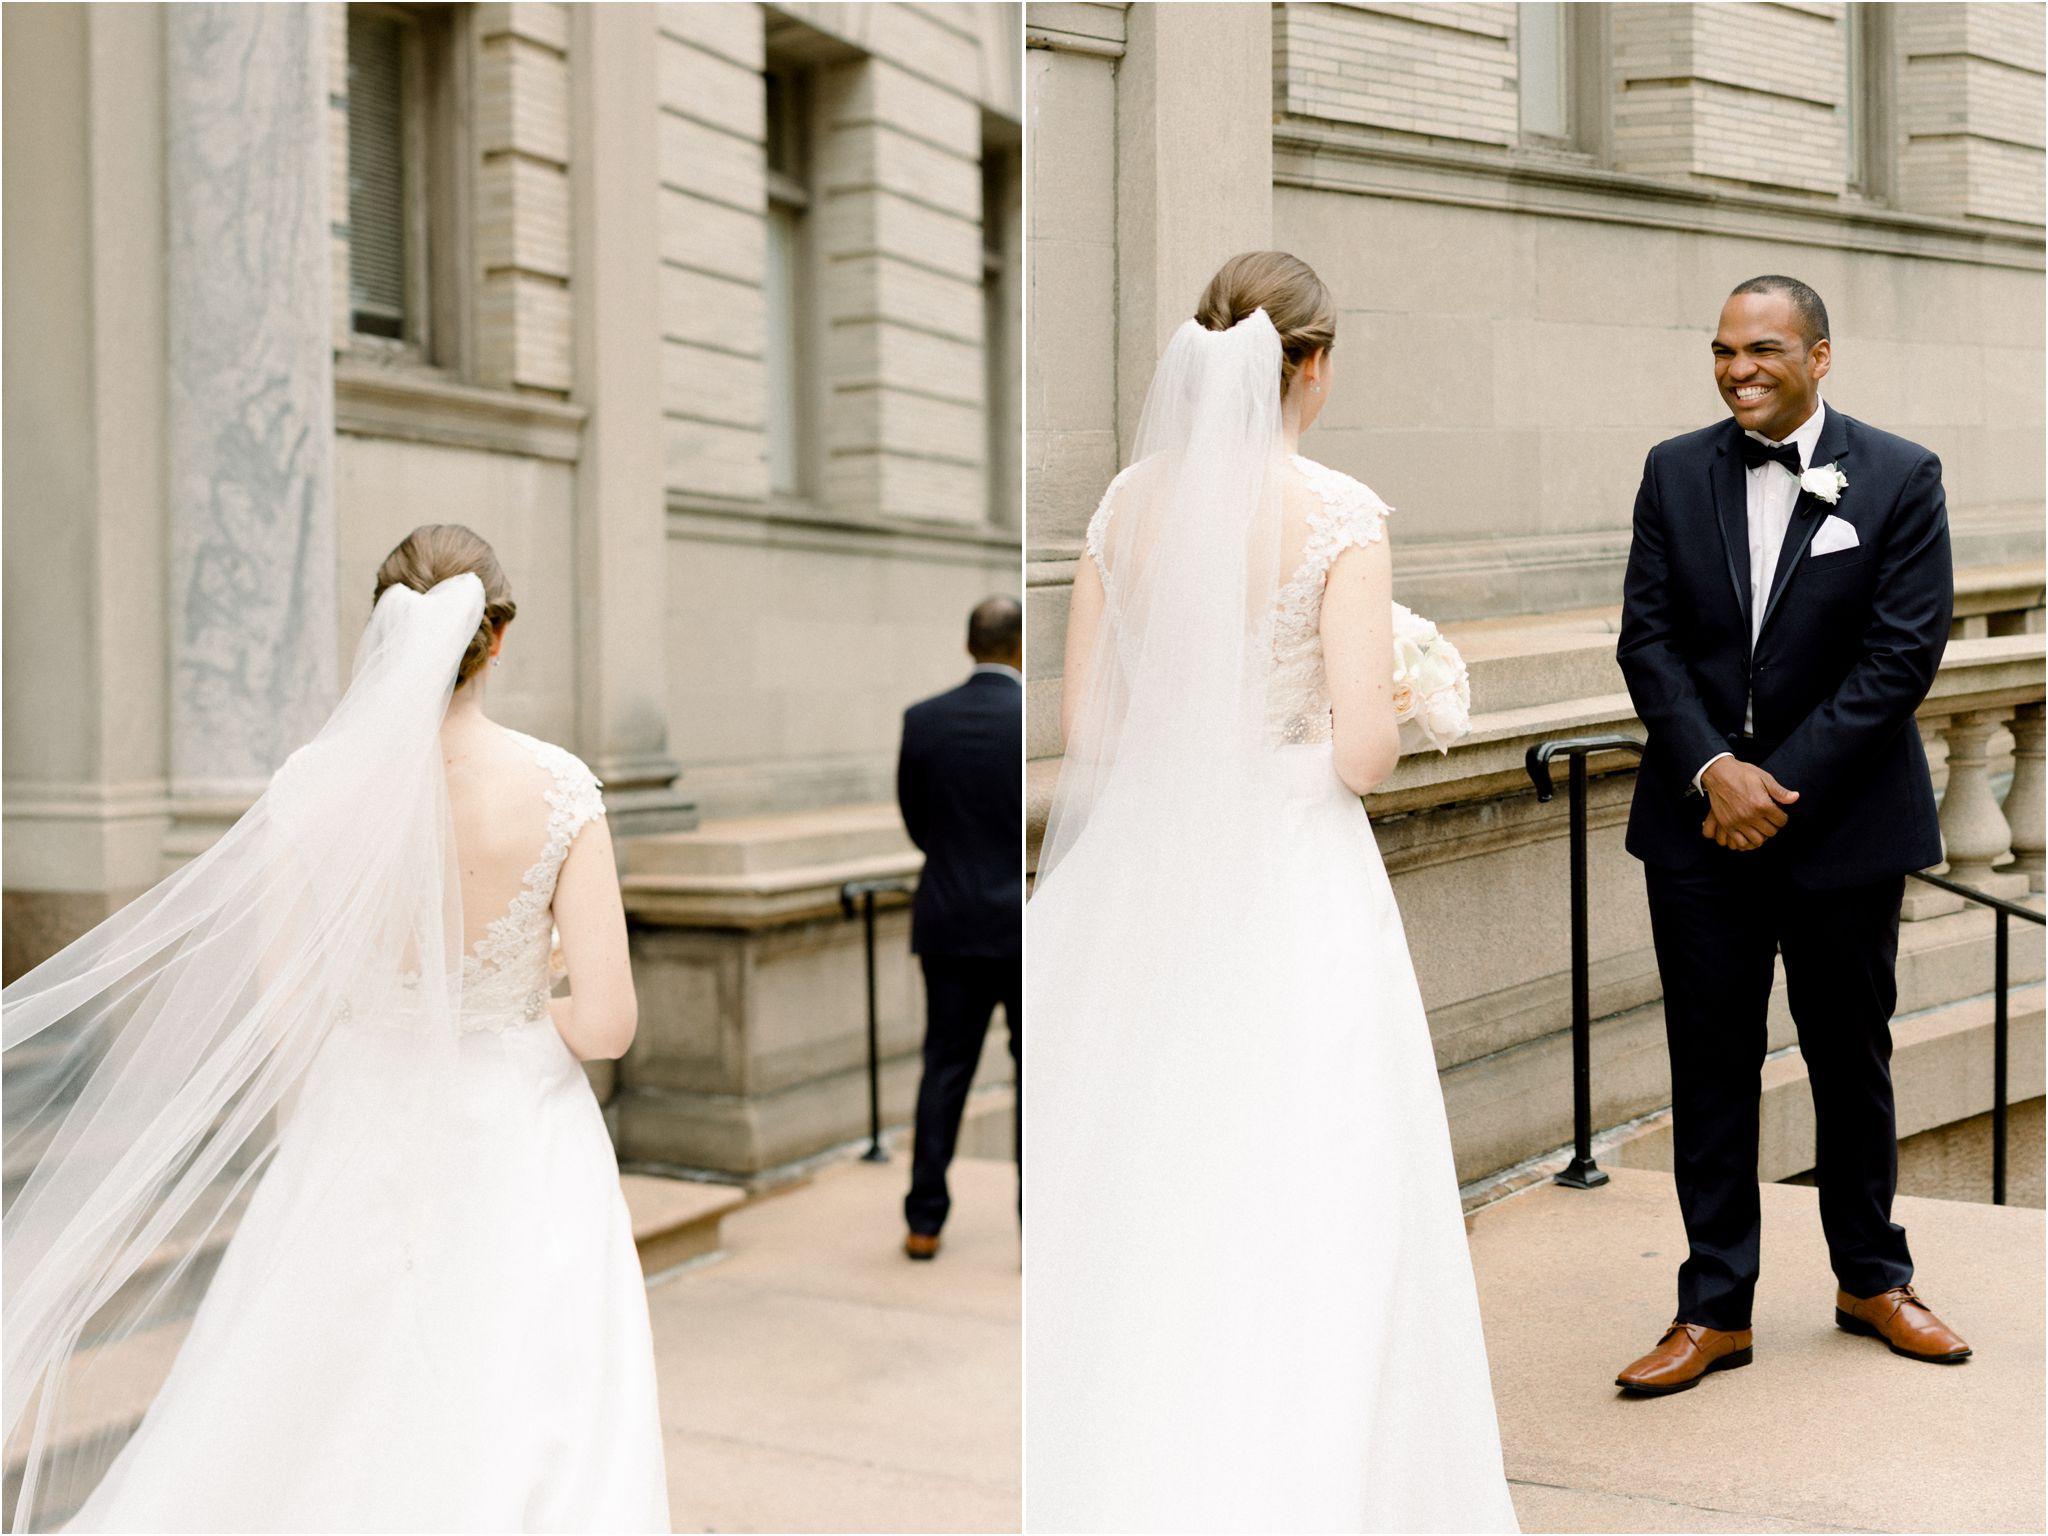 providence-public-library-wedding-images_00015.JPG